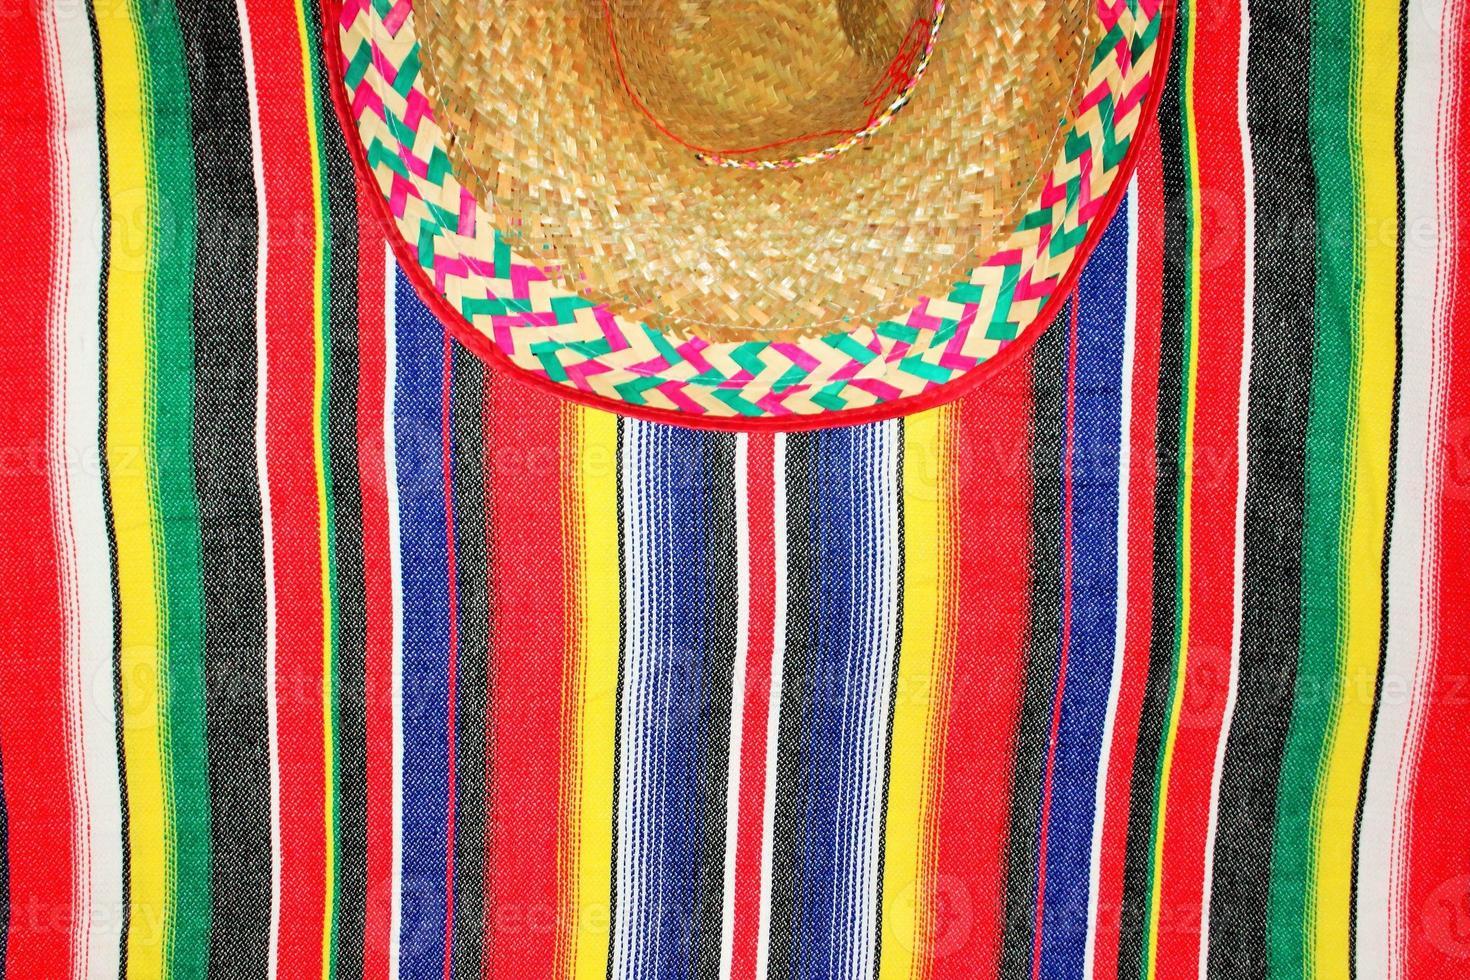 fiesta mexikansk poncho sombrero bakgrund med kopia utrymme foto